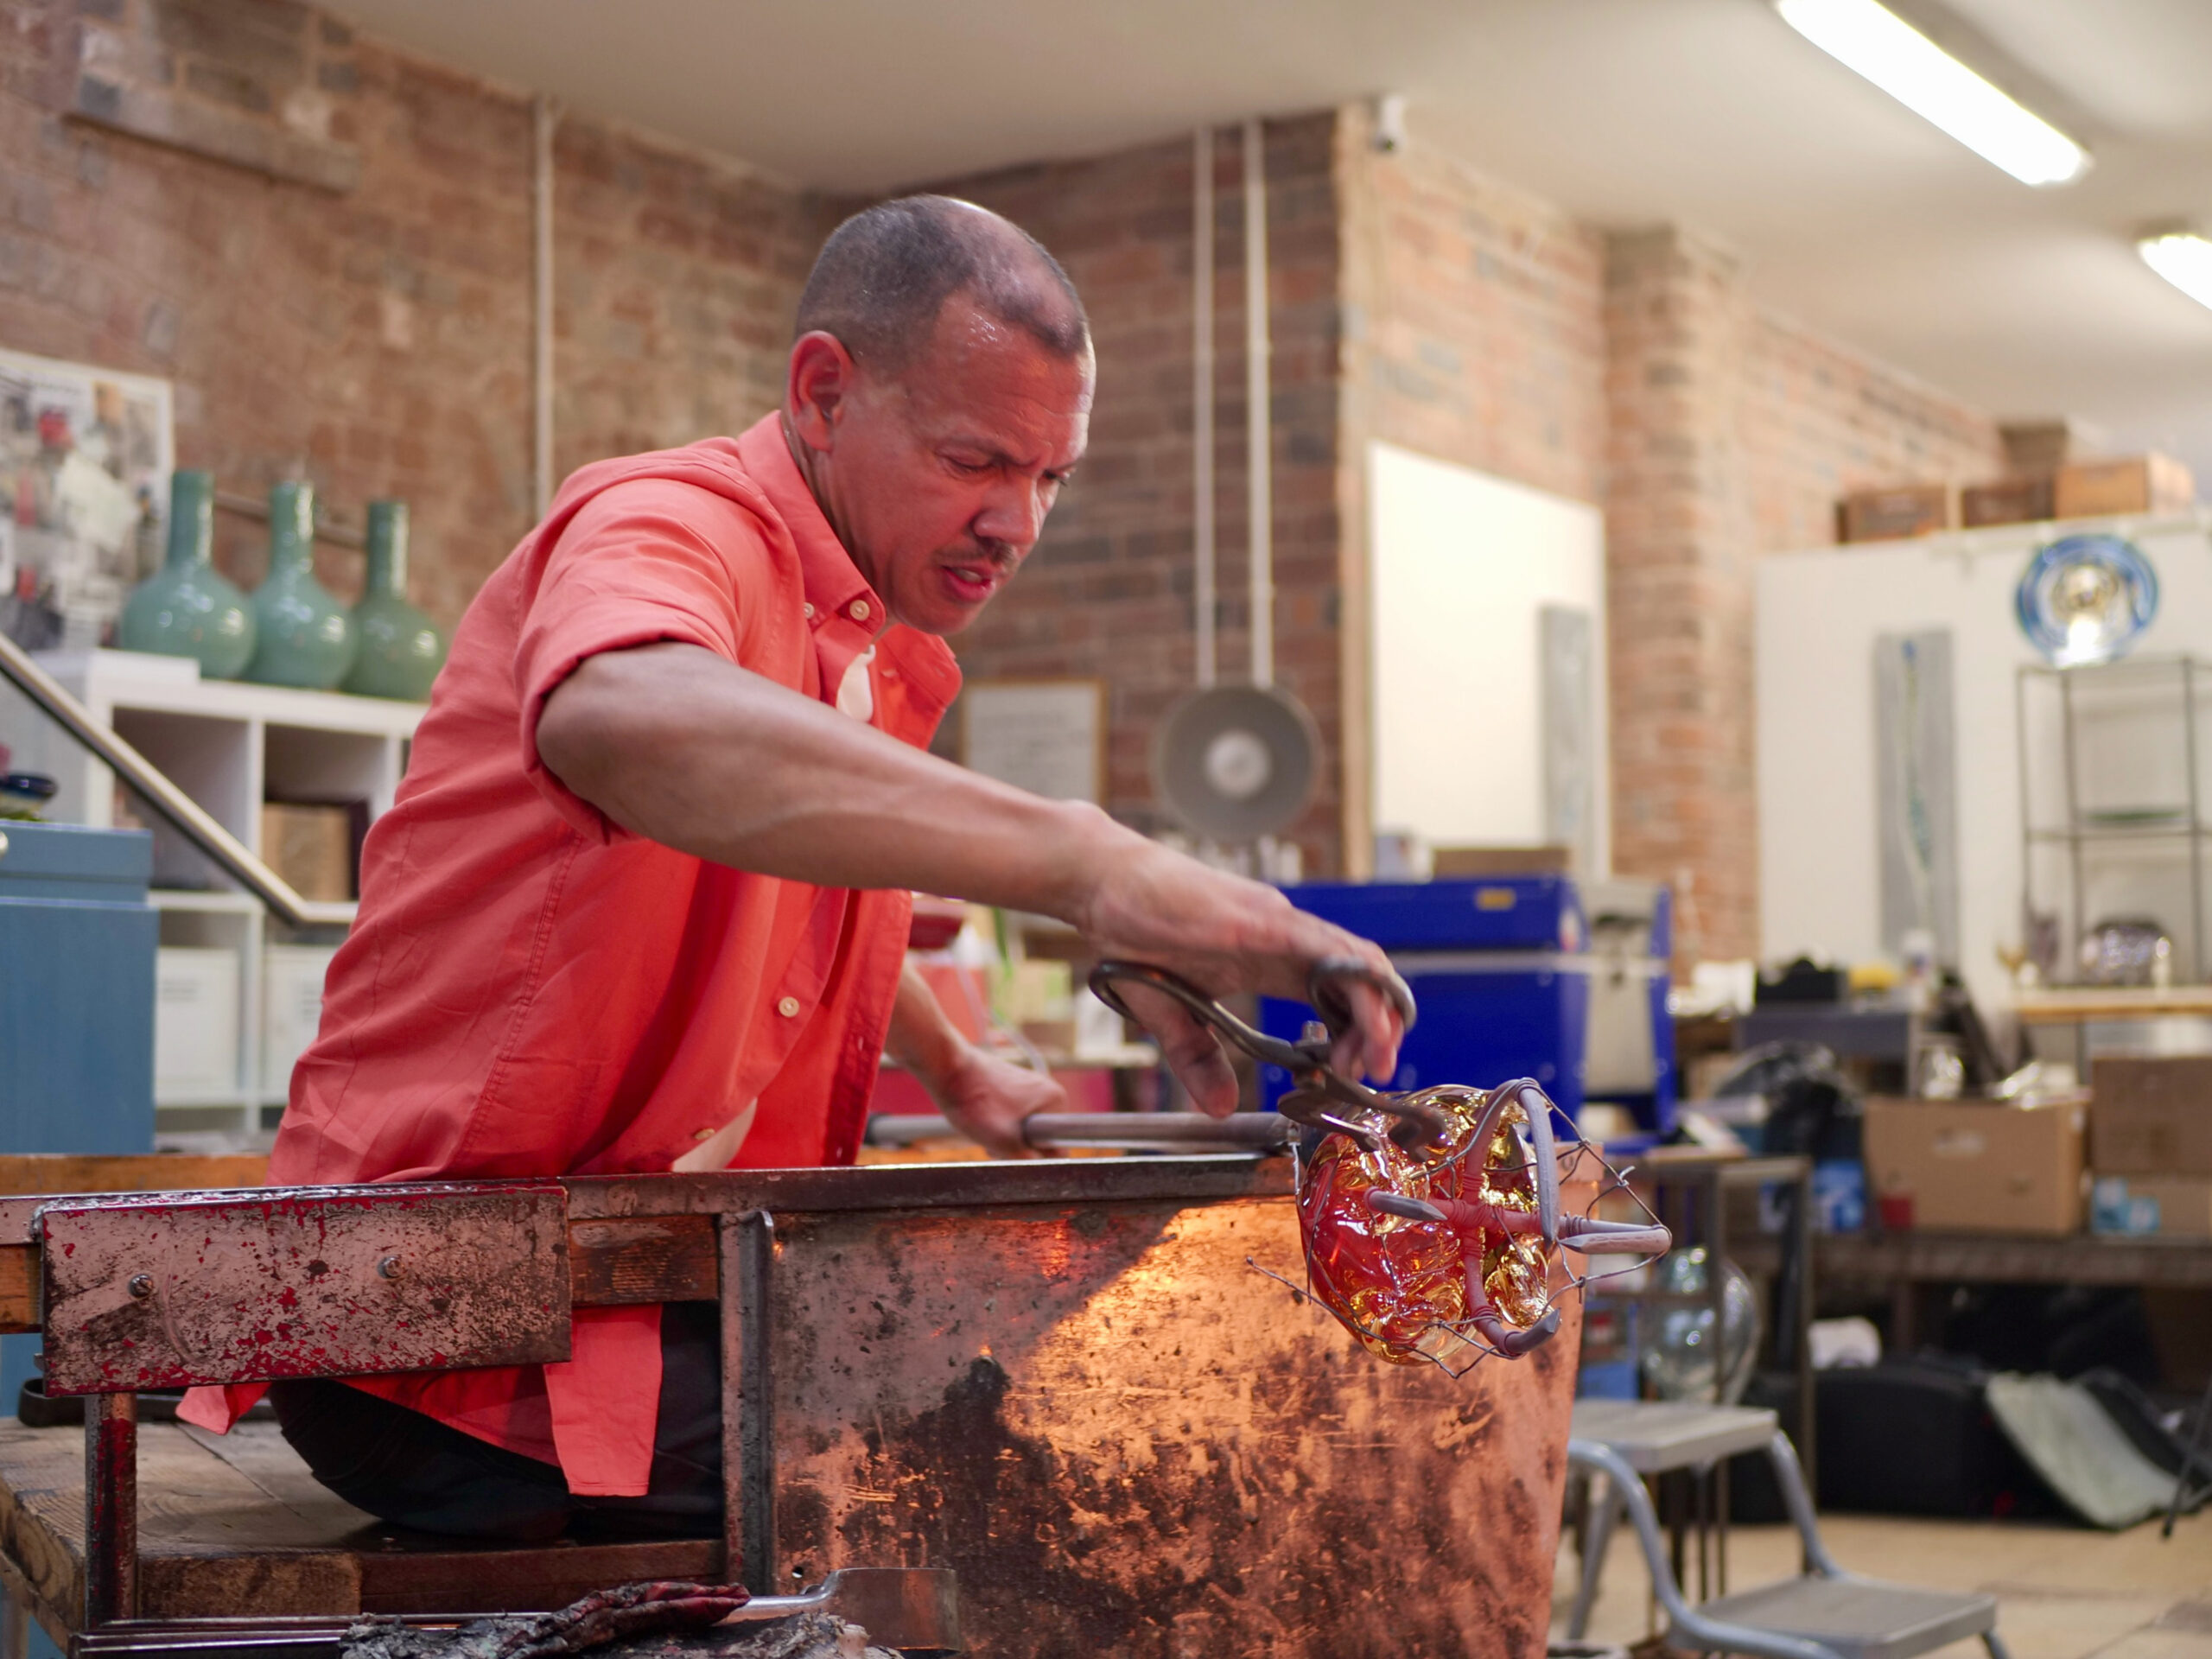 Artist Chris Day in his workshop